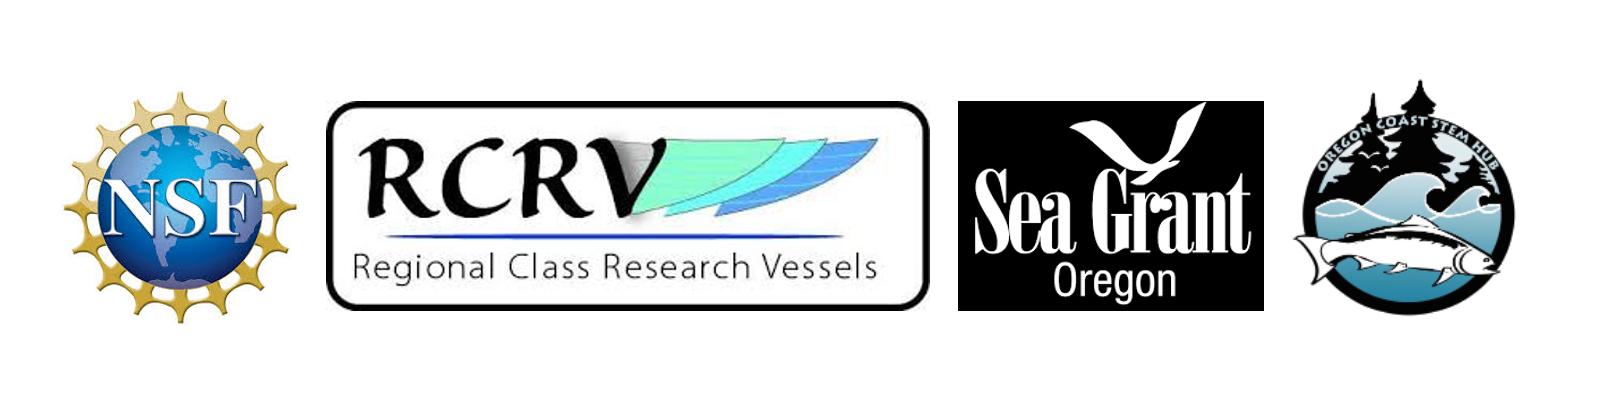 NSF RCRV OCSH and OSG logos